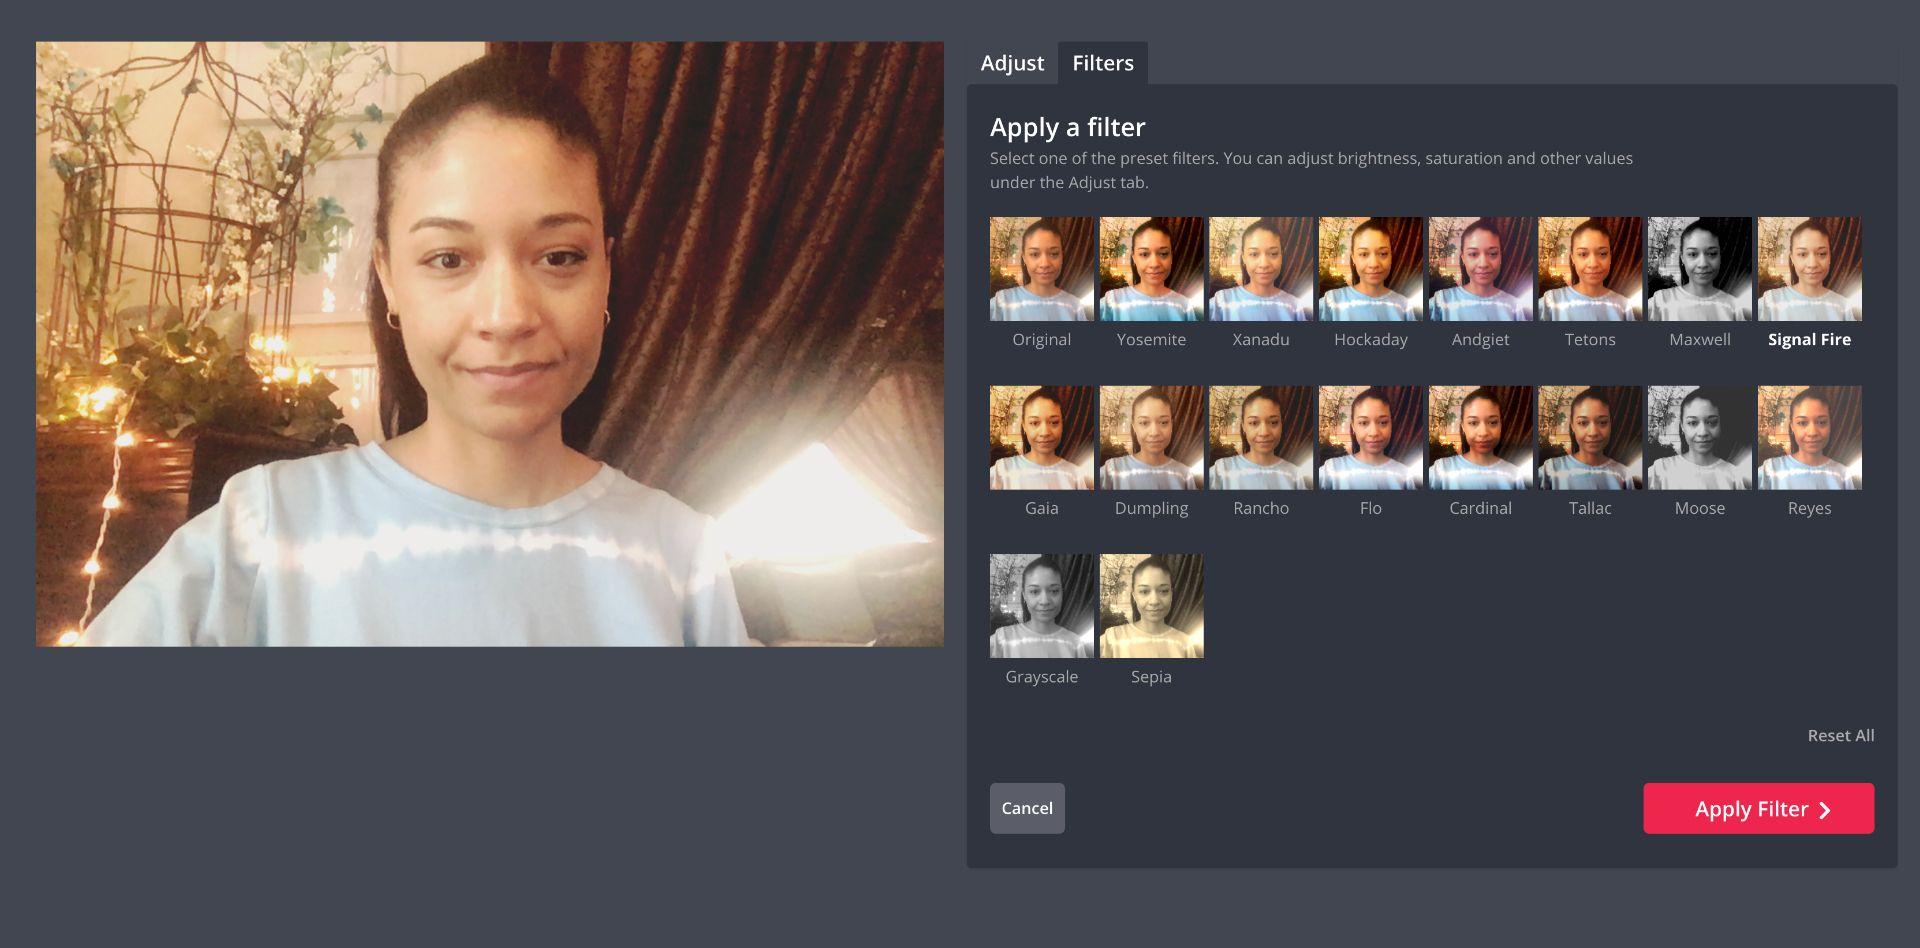 captura de pantalla de un filtro en Kapwing